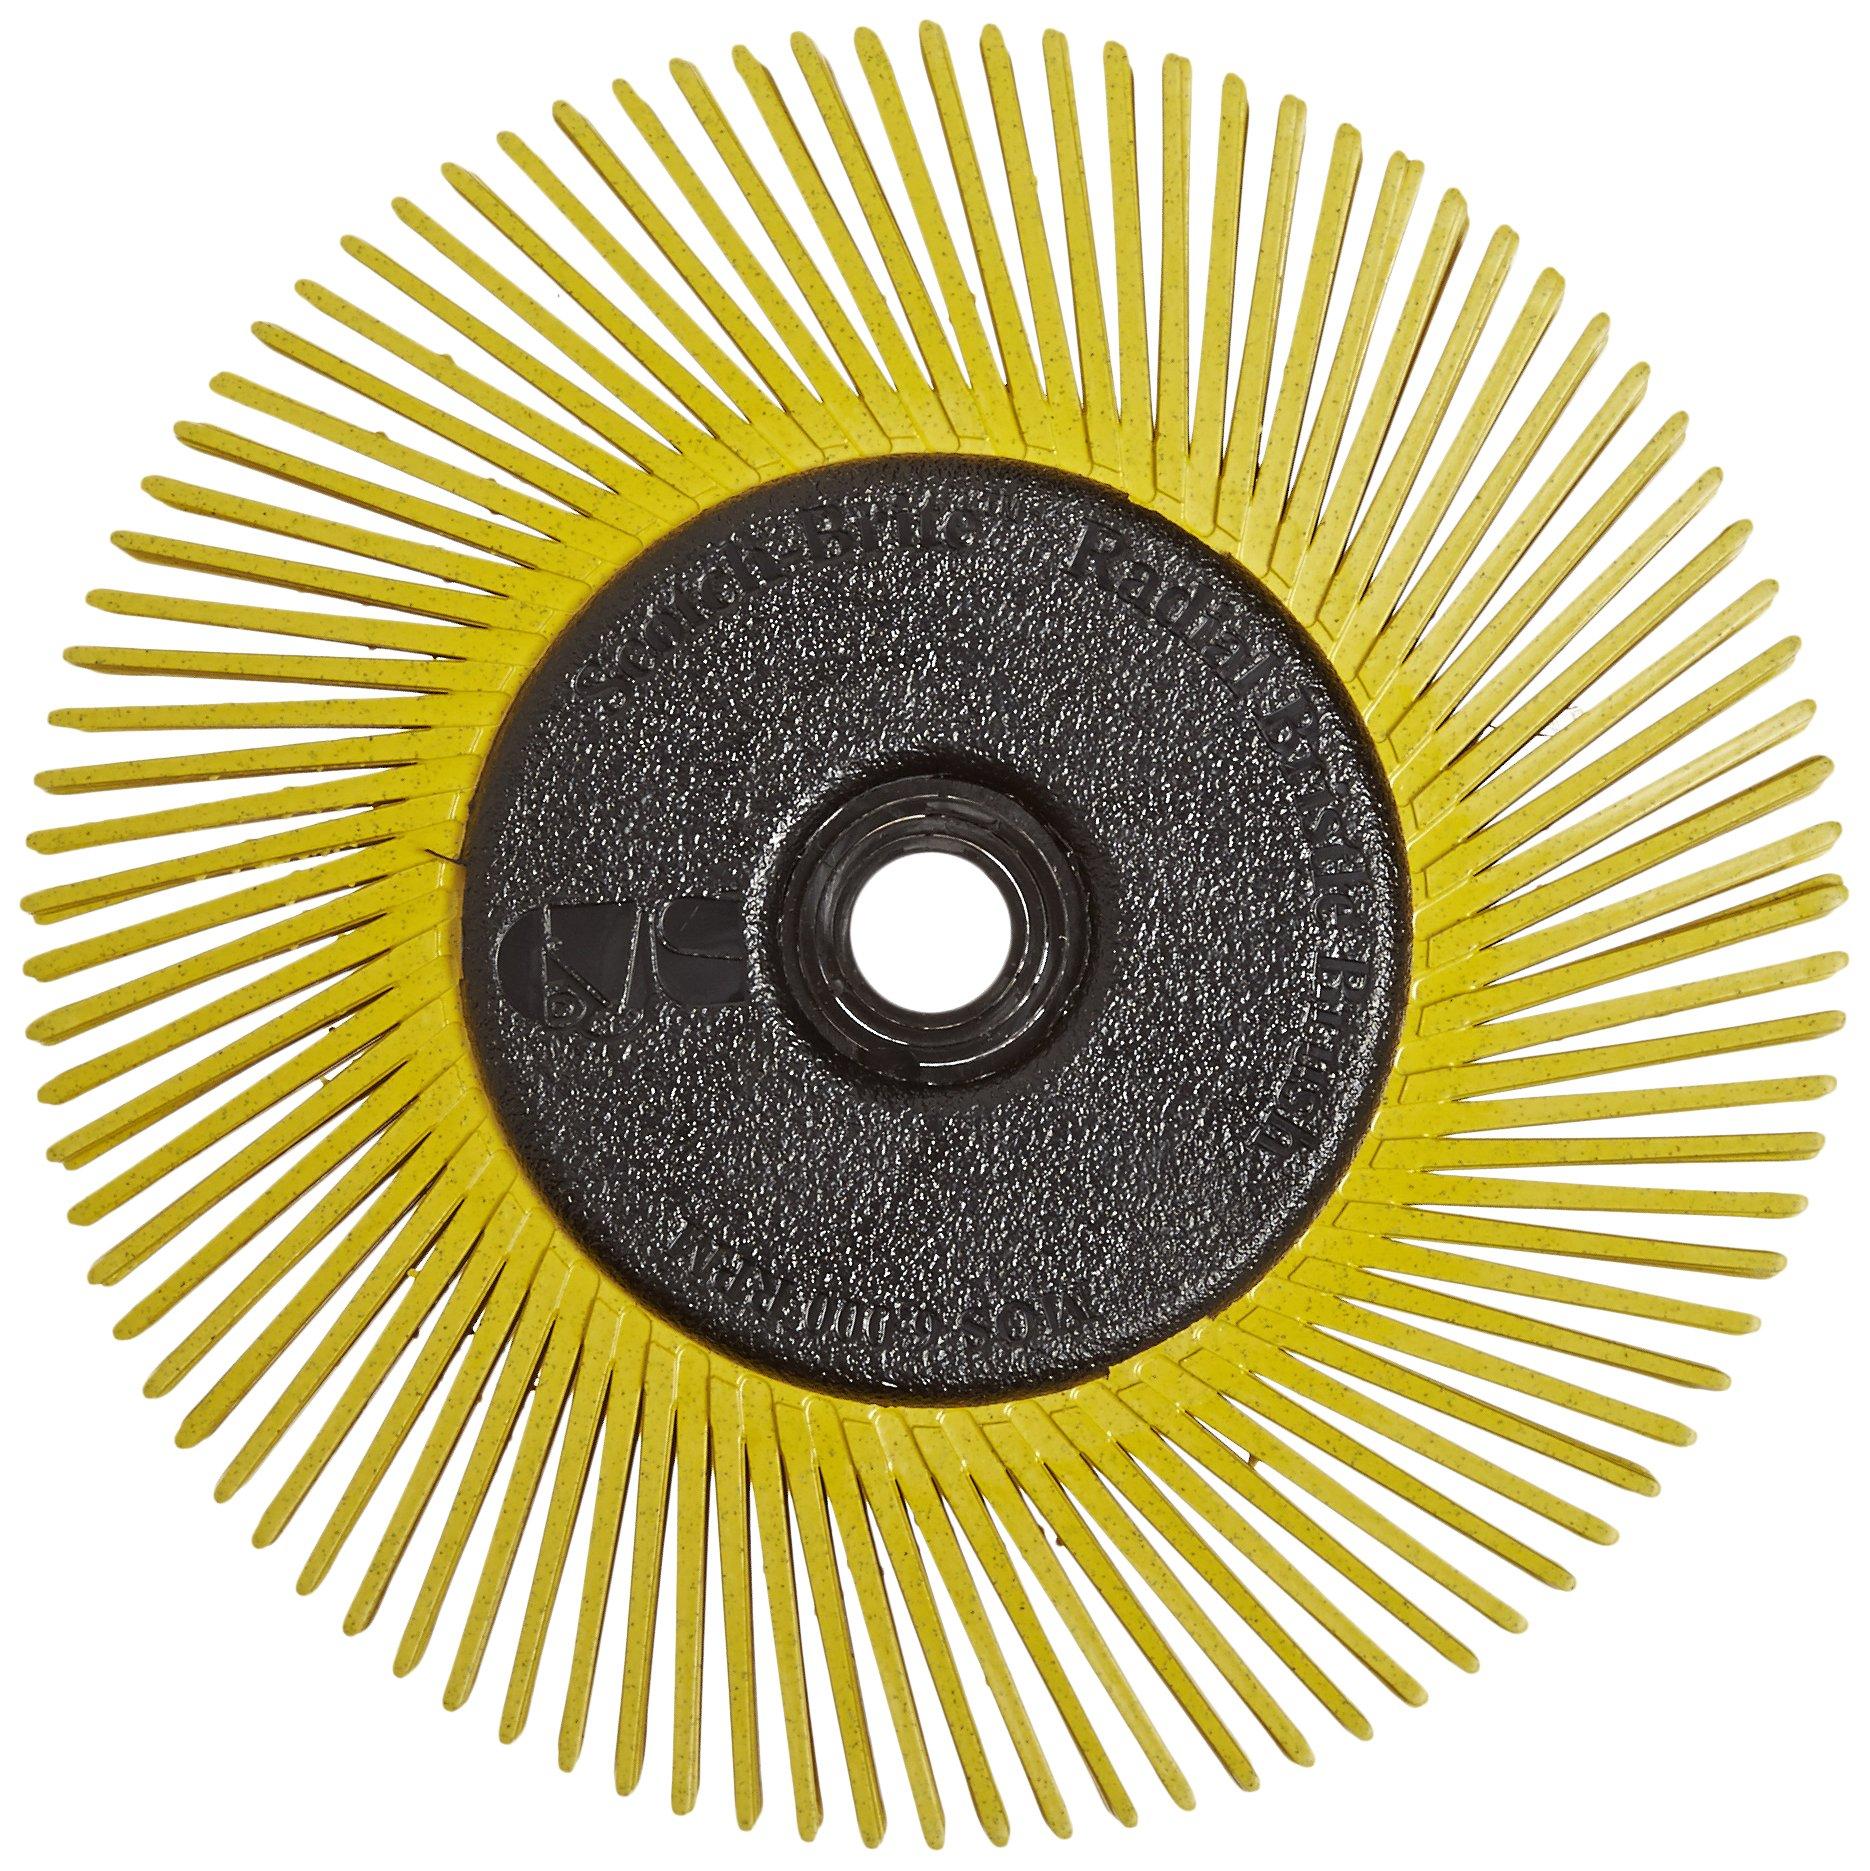 Scotch-Brite(TM) Radial Bristle Brush, Cubitron/Aluminum Oxide, 6000 rpm, 6 Diameter x 1/2 Width, 80 Grit (Pack of 1)